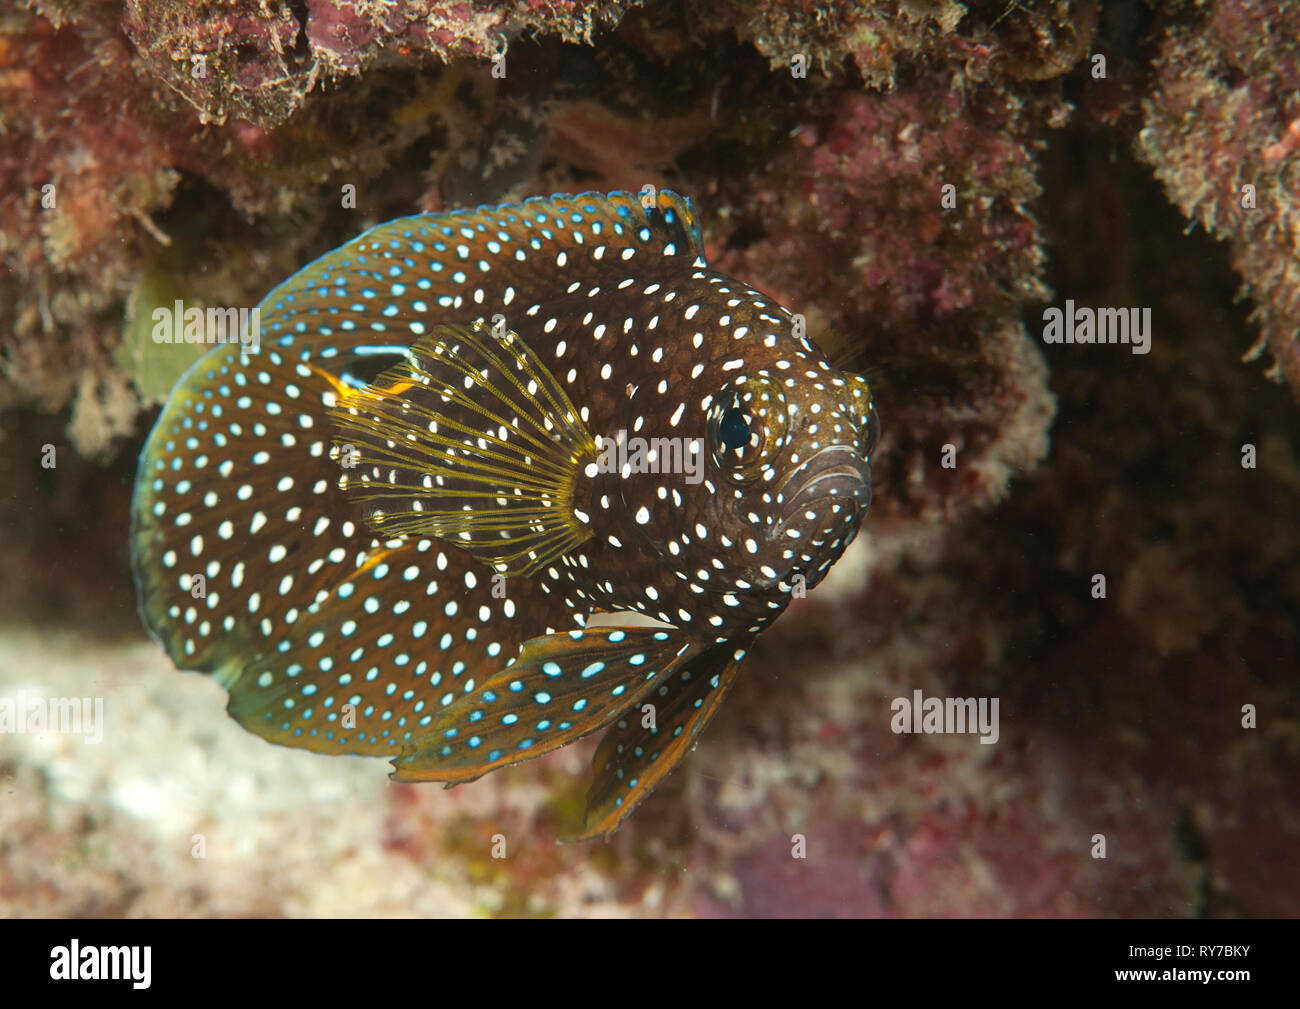 Comet or marine betta (Calloplesiops altivelis) swimming over corals of Bali, Indonesia Stock Photo